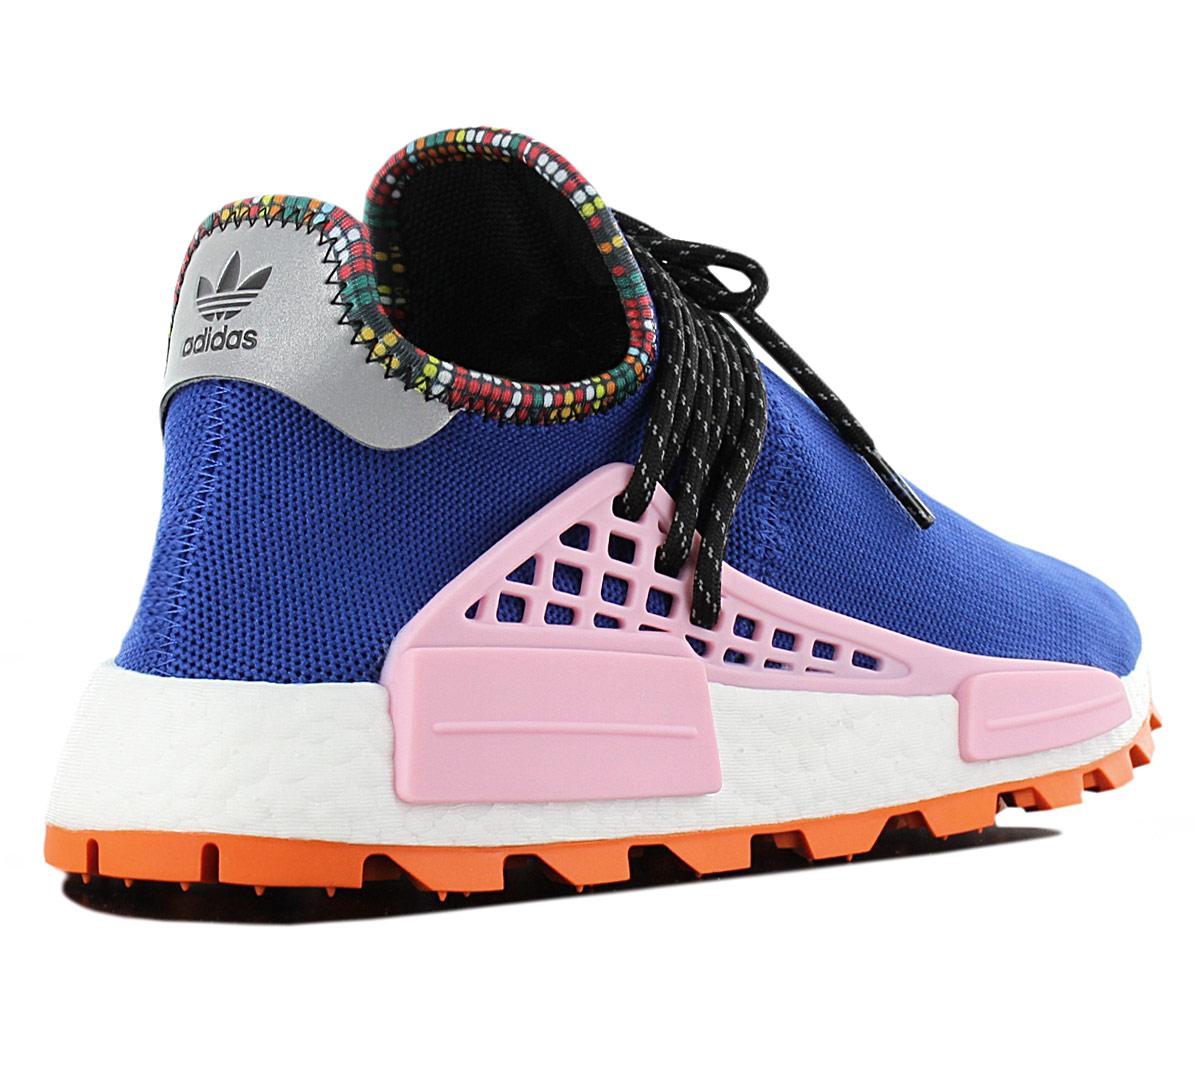 Adidas Originals Adidas Originals x PW Solar HU NMD EE7579